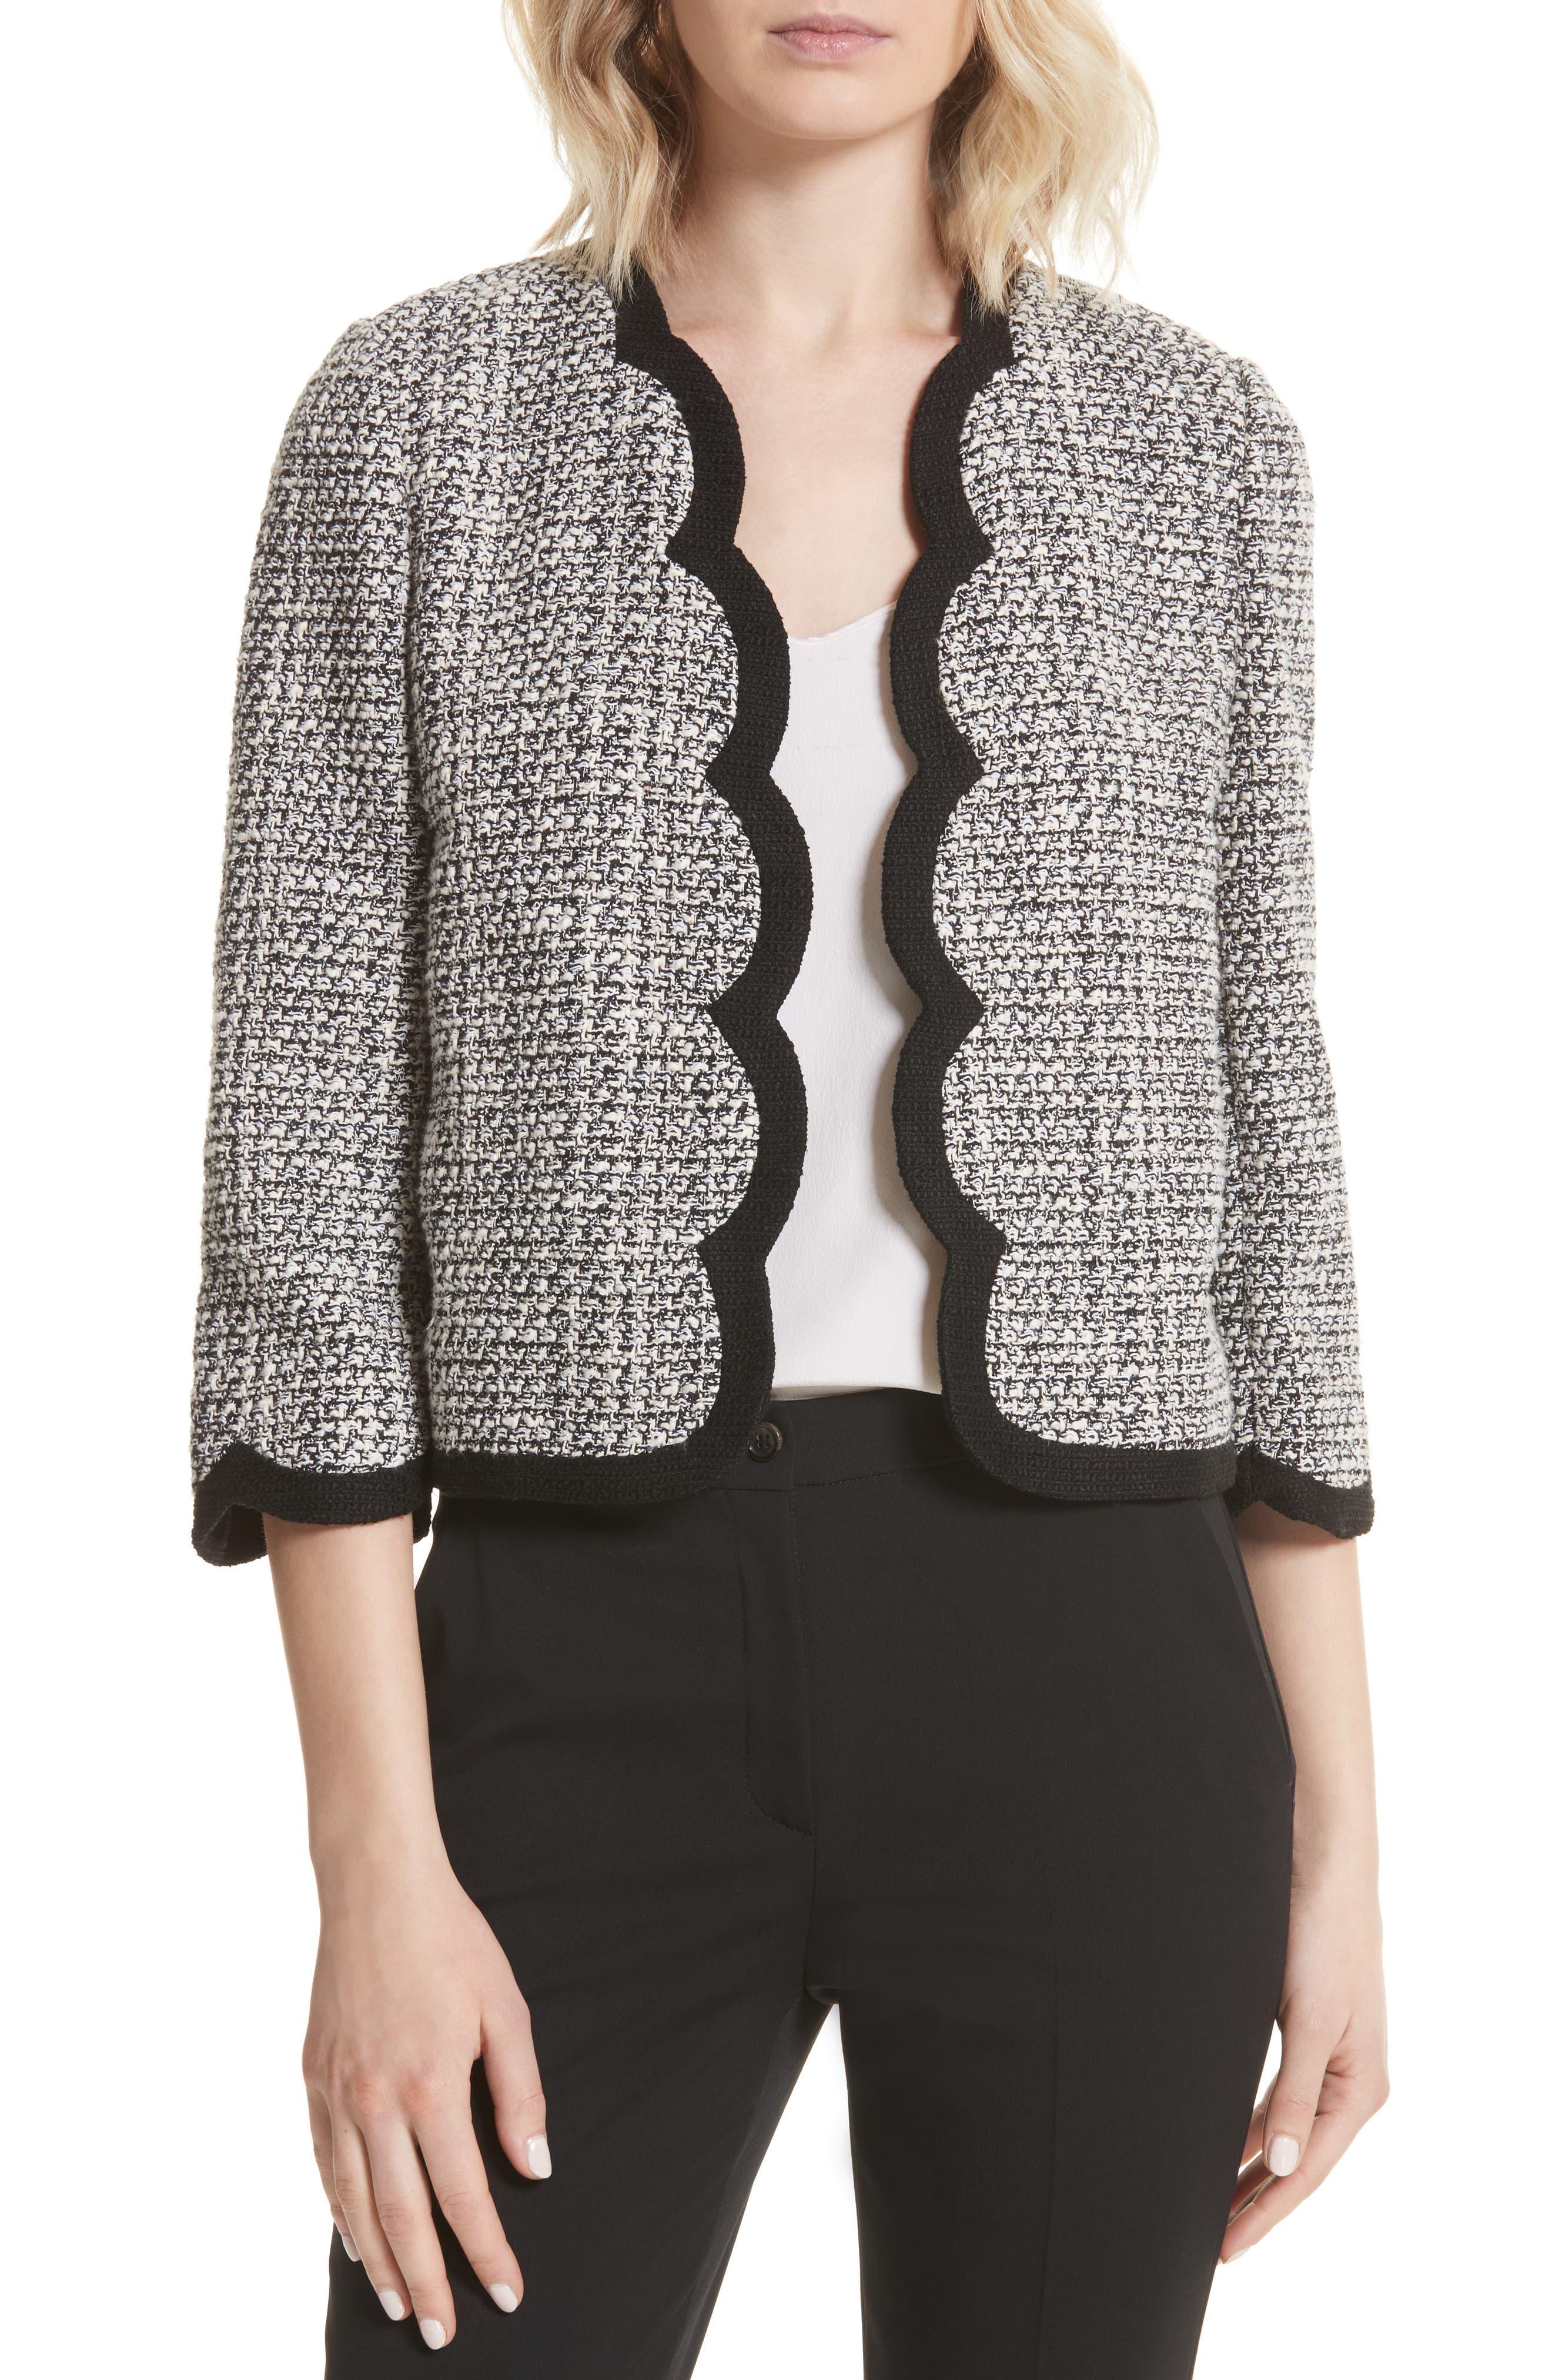 Alternate Image 1 Selected - kate spade new york scallop tweed jacket